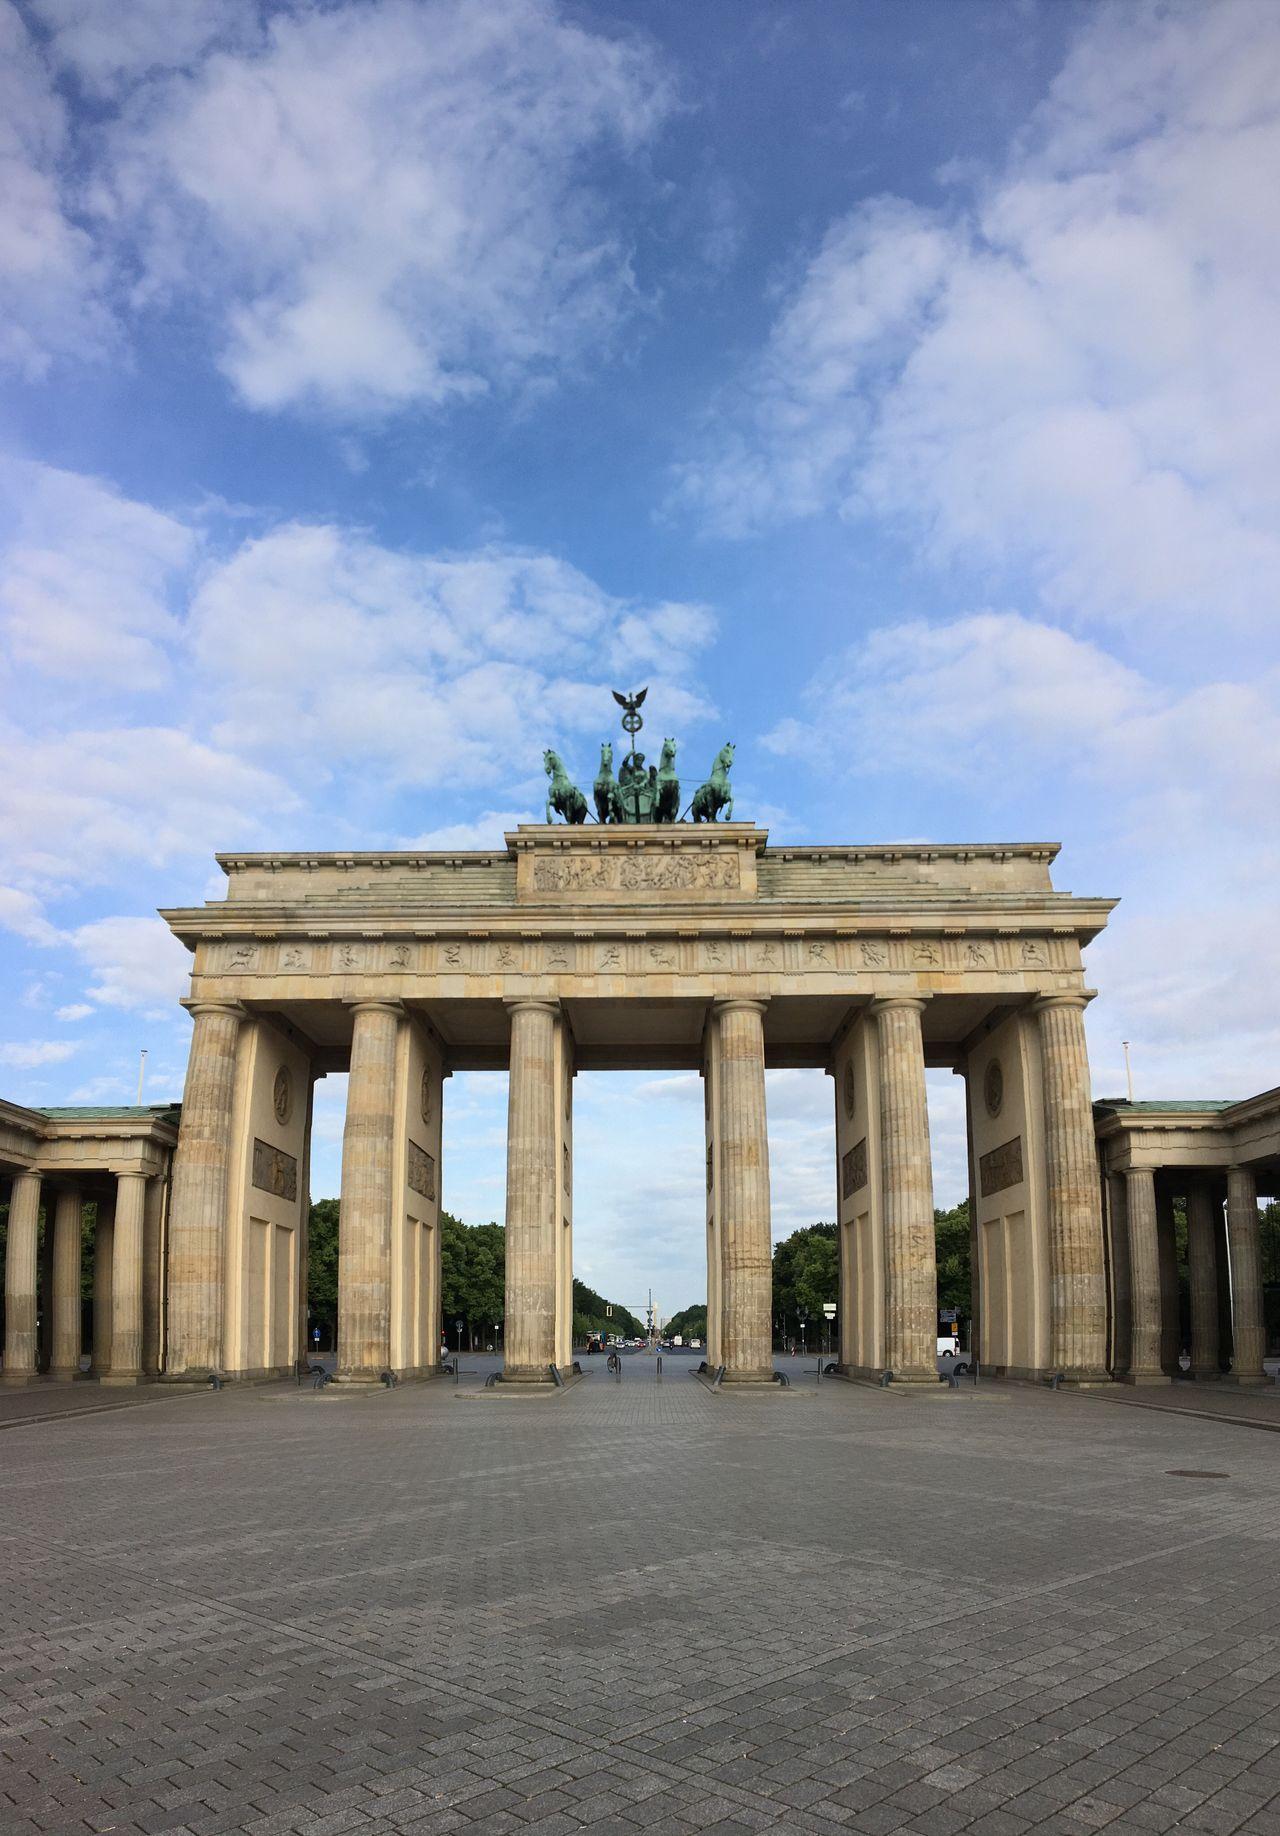 Early Morning Run in Berlin! — Done! Ran 5.45 kilometers w/ Nike Running Club FromWhereIRun